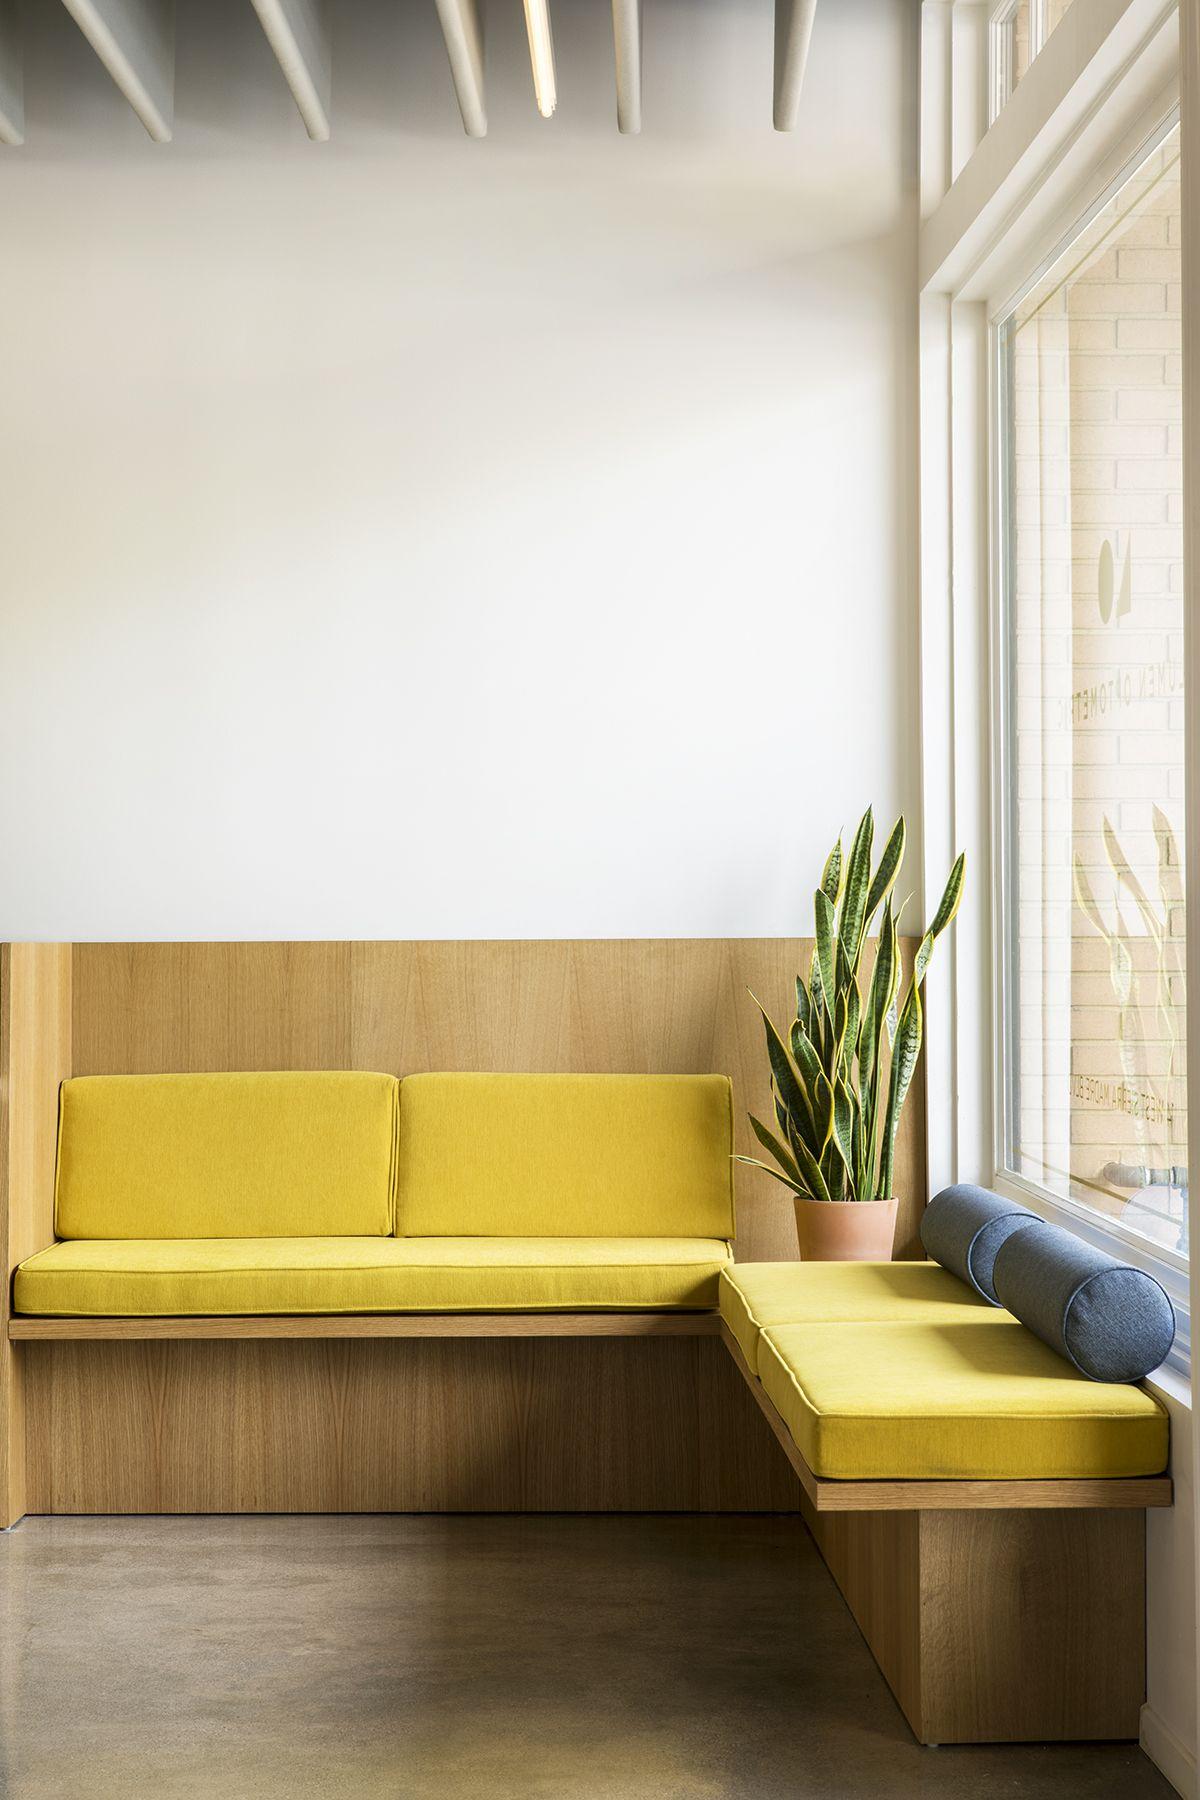 Week Of January 15 2018 Furniture Design Home Interior